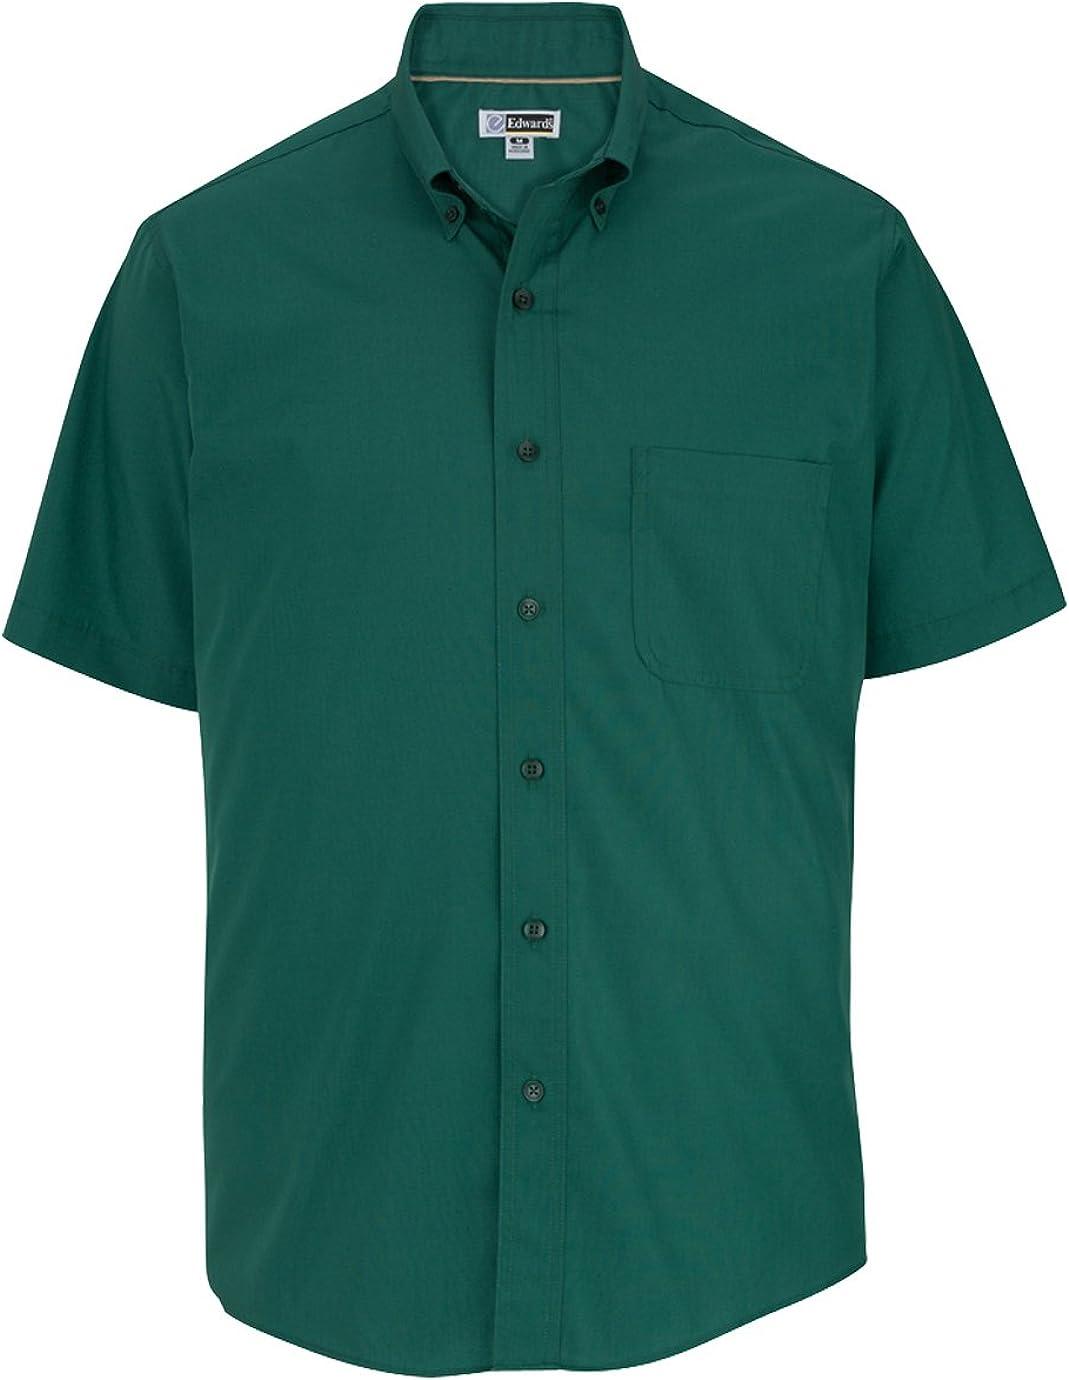 Edwards Garment Men's Big And Tall Wrinkle Resistant Poplin Shirt_HUNTER_5XLT